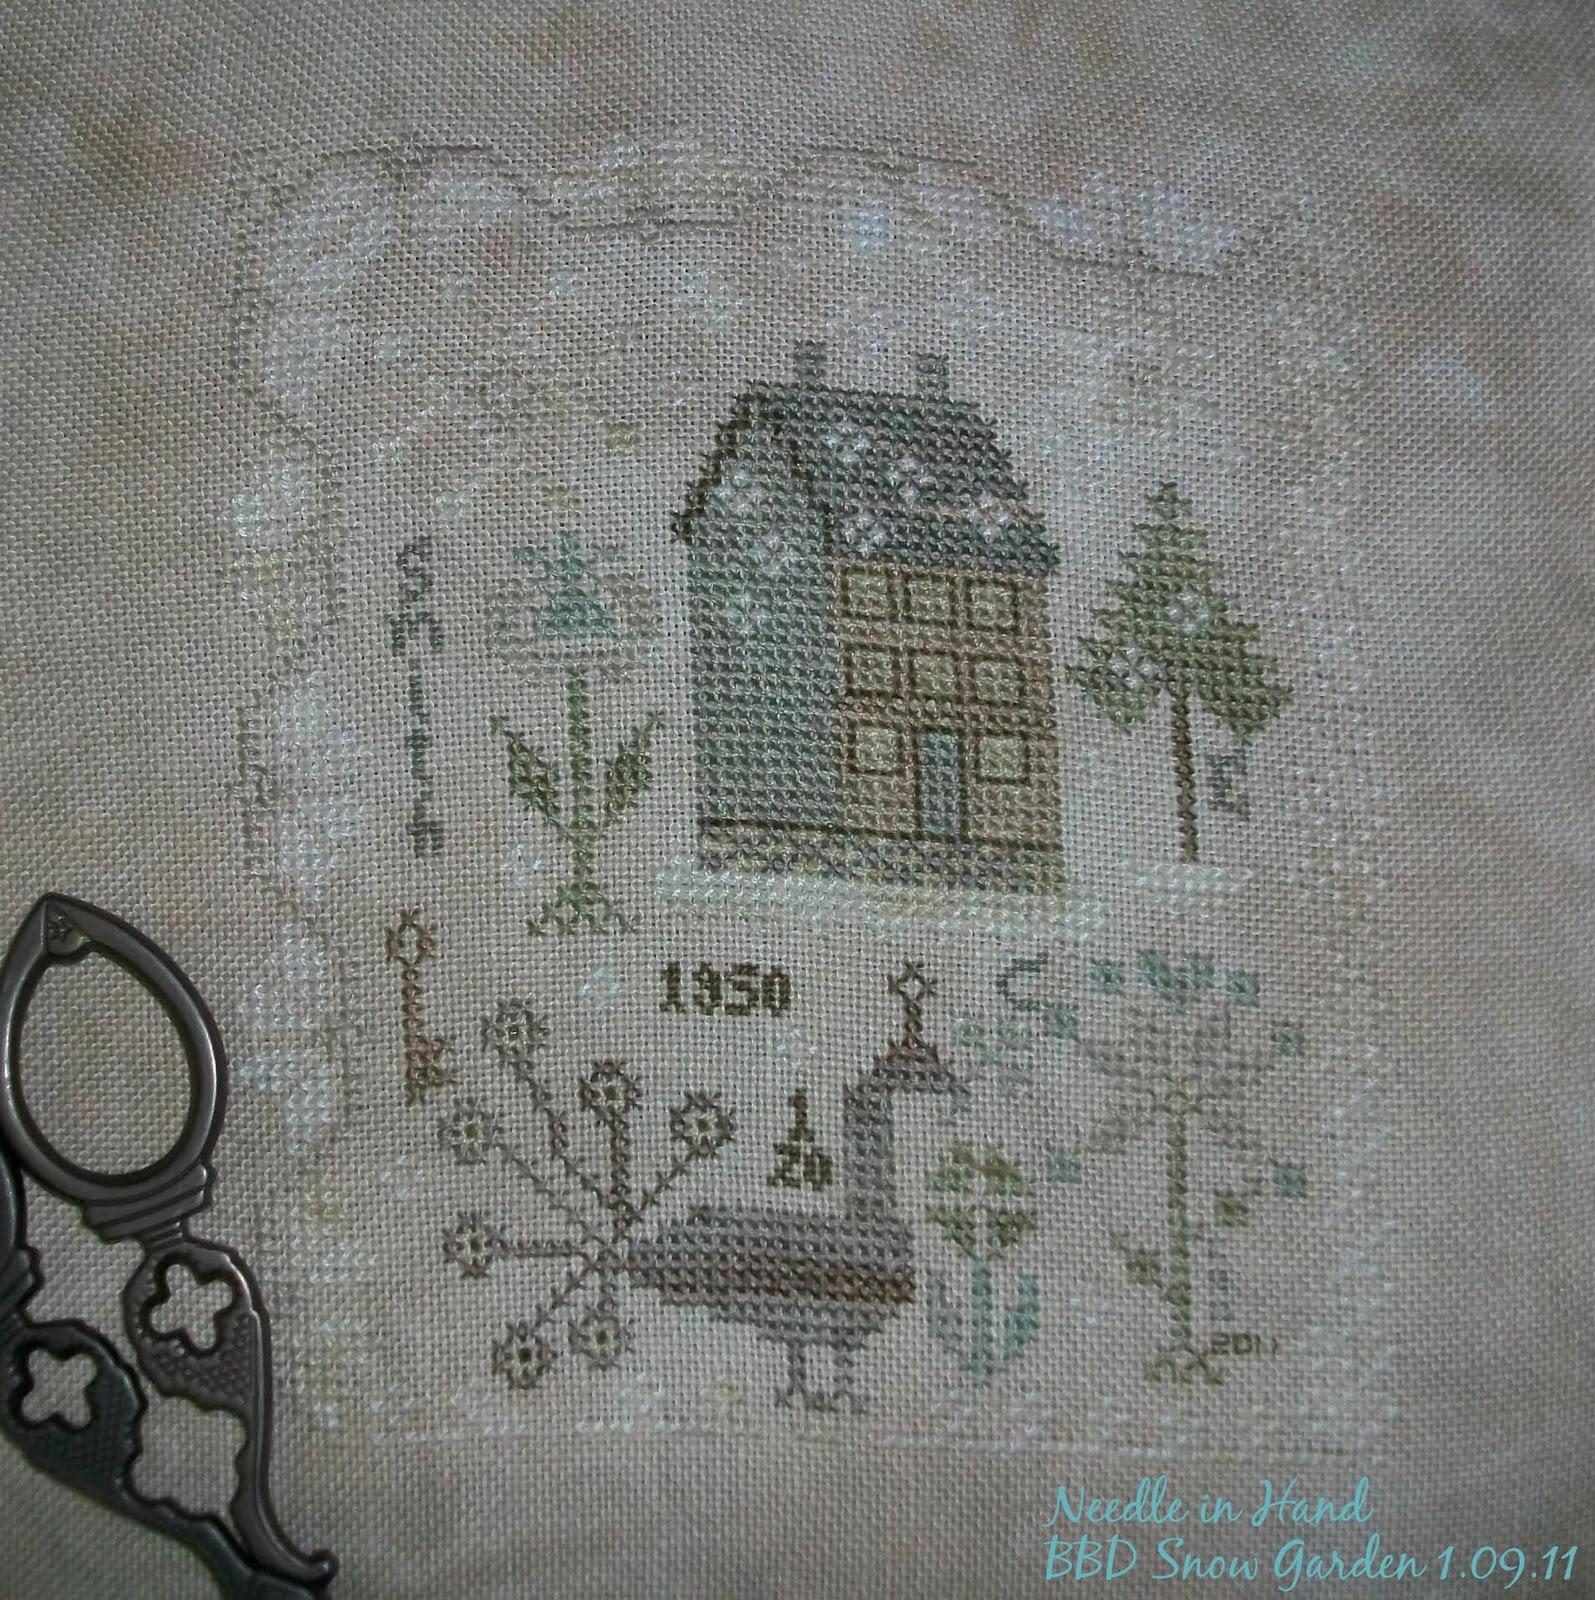 Blackbird designs community blog for embroiderers for Blackbird designs tending the garden